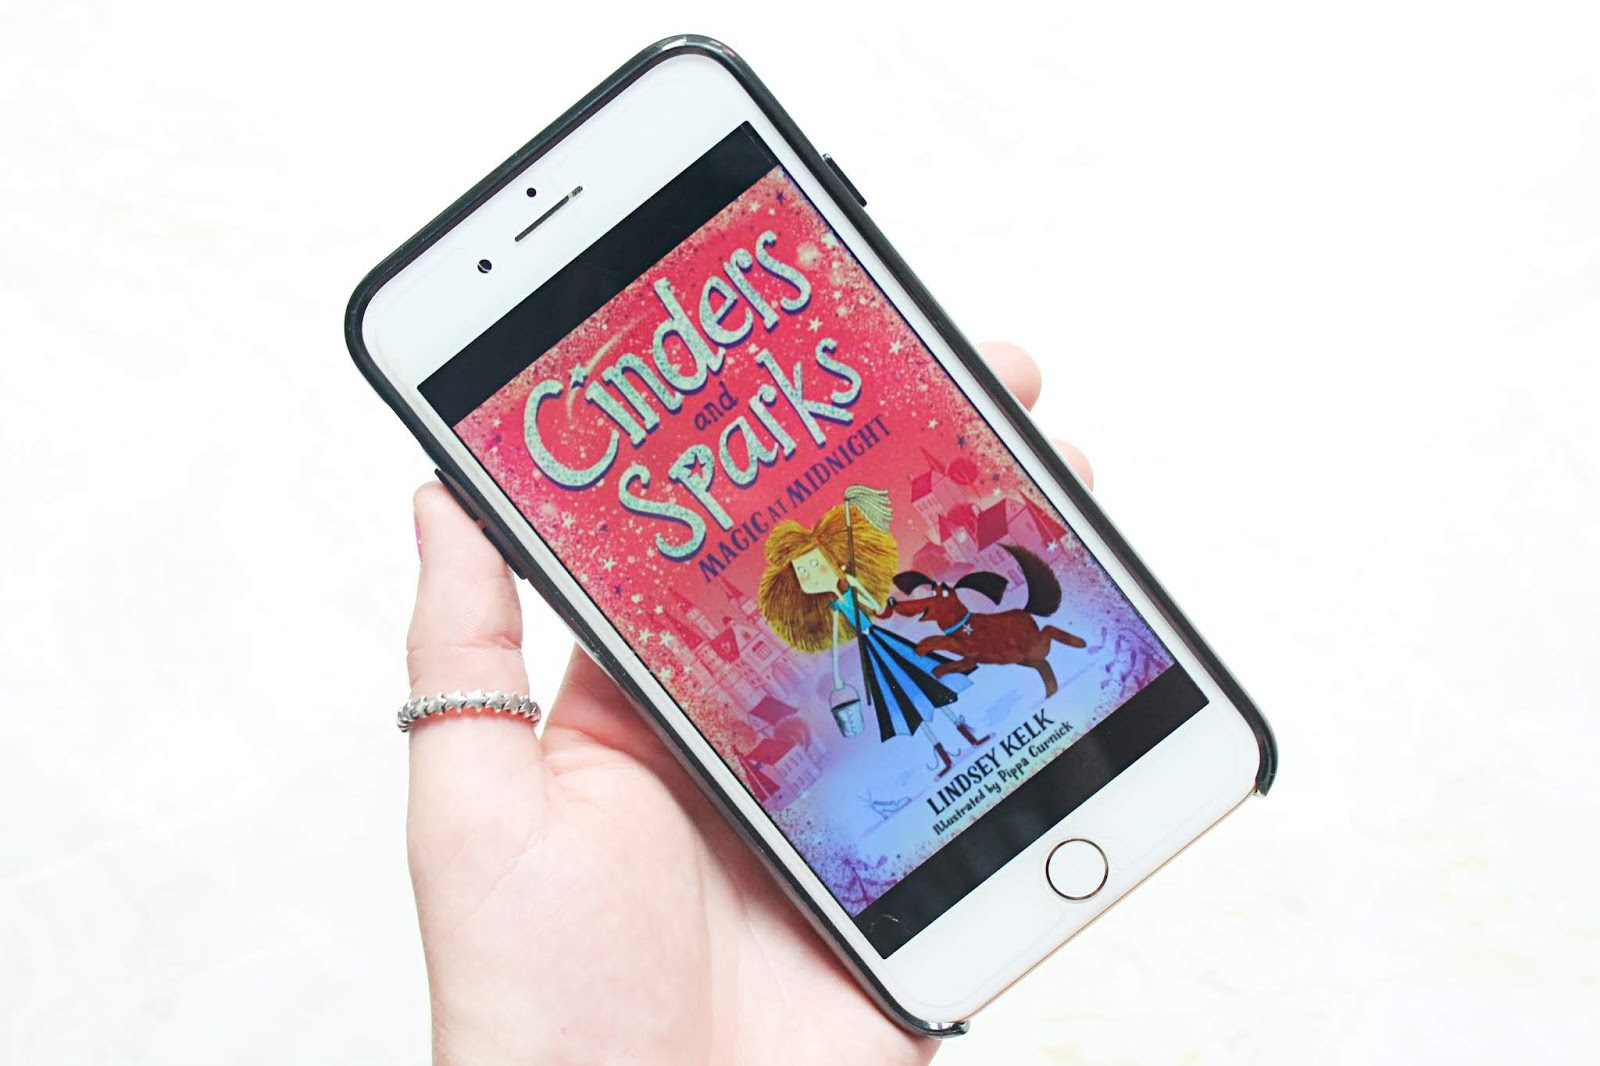 Cinders & Sparks: Magic at Midnight By Lindsey Kelk